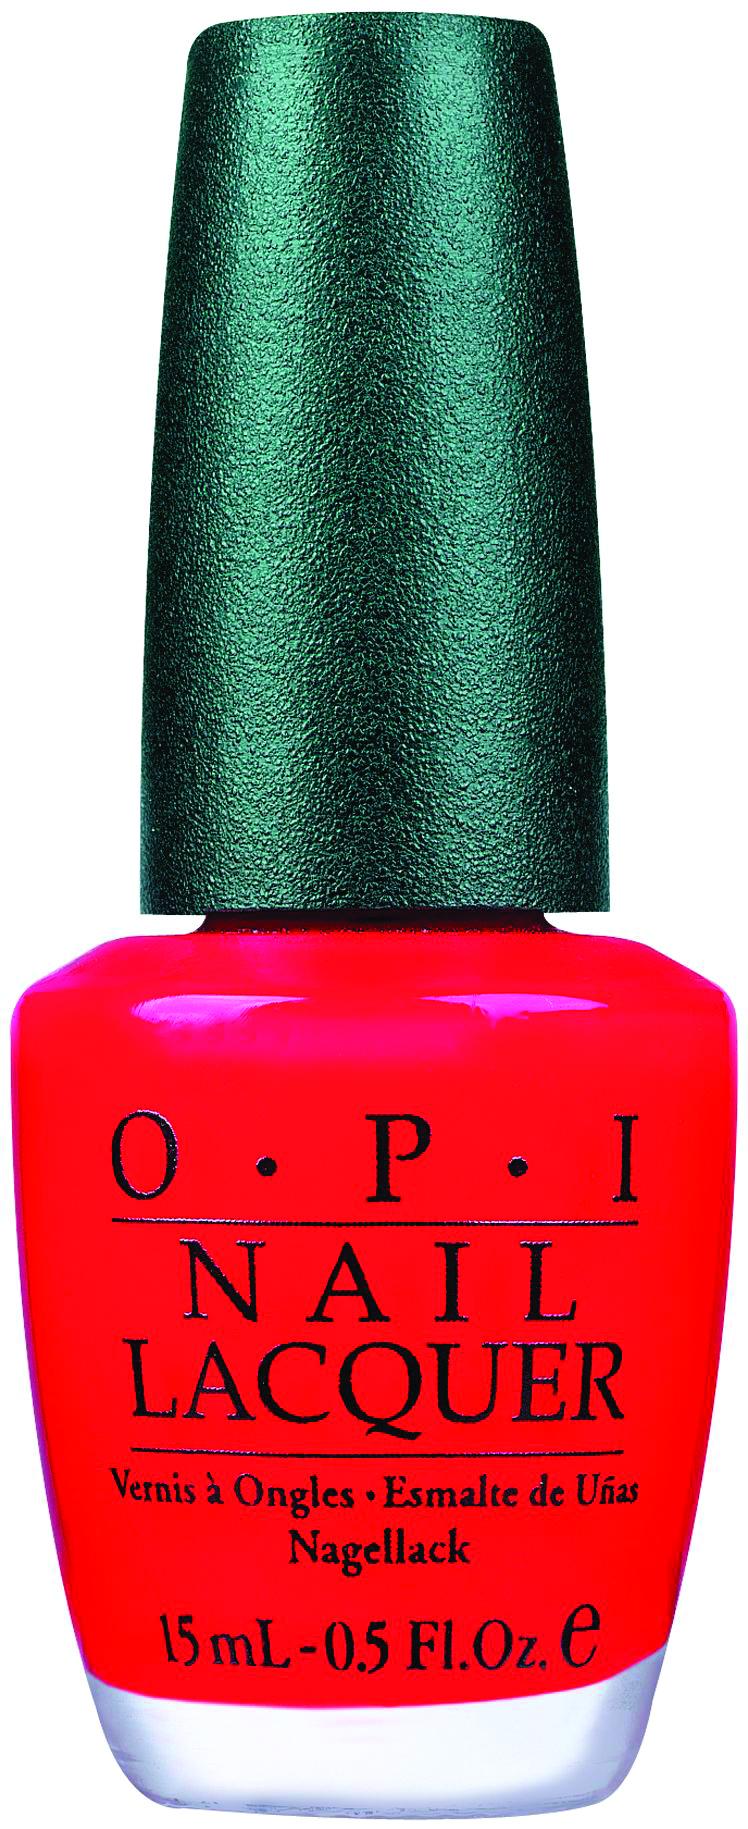 <p>FAVORITE POLISH (TRADITIONAL)</p> <p>1. <strong>OPI Products:</strong> Nail Lacquer</p> <p>2. <strong>China Glaze: </strong>Polish</p> <p>3. <strong>CND:</strong> Colour &amp; Effects</p> <p>4. <strong>Essie Cosmetics:</strong> Nail Polishes</p> <p>5. <strong>Zoya and Qtica:</strong> Zoya Nail Polish</p>